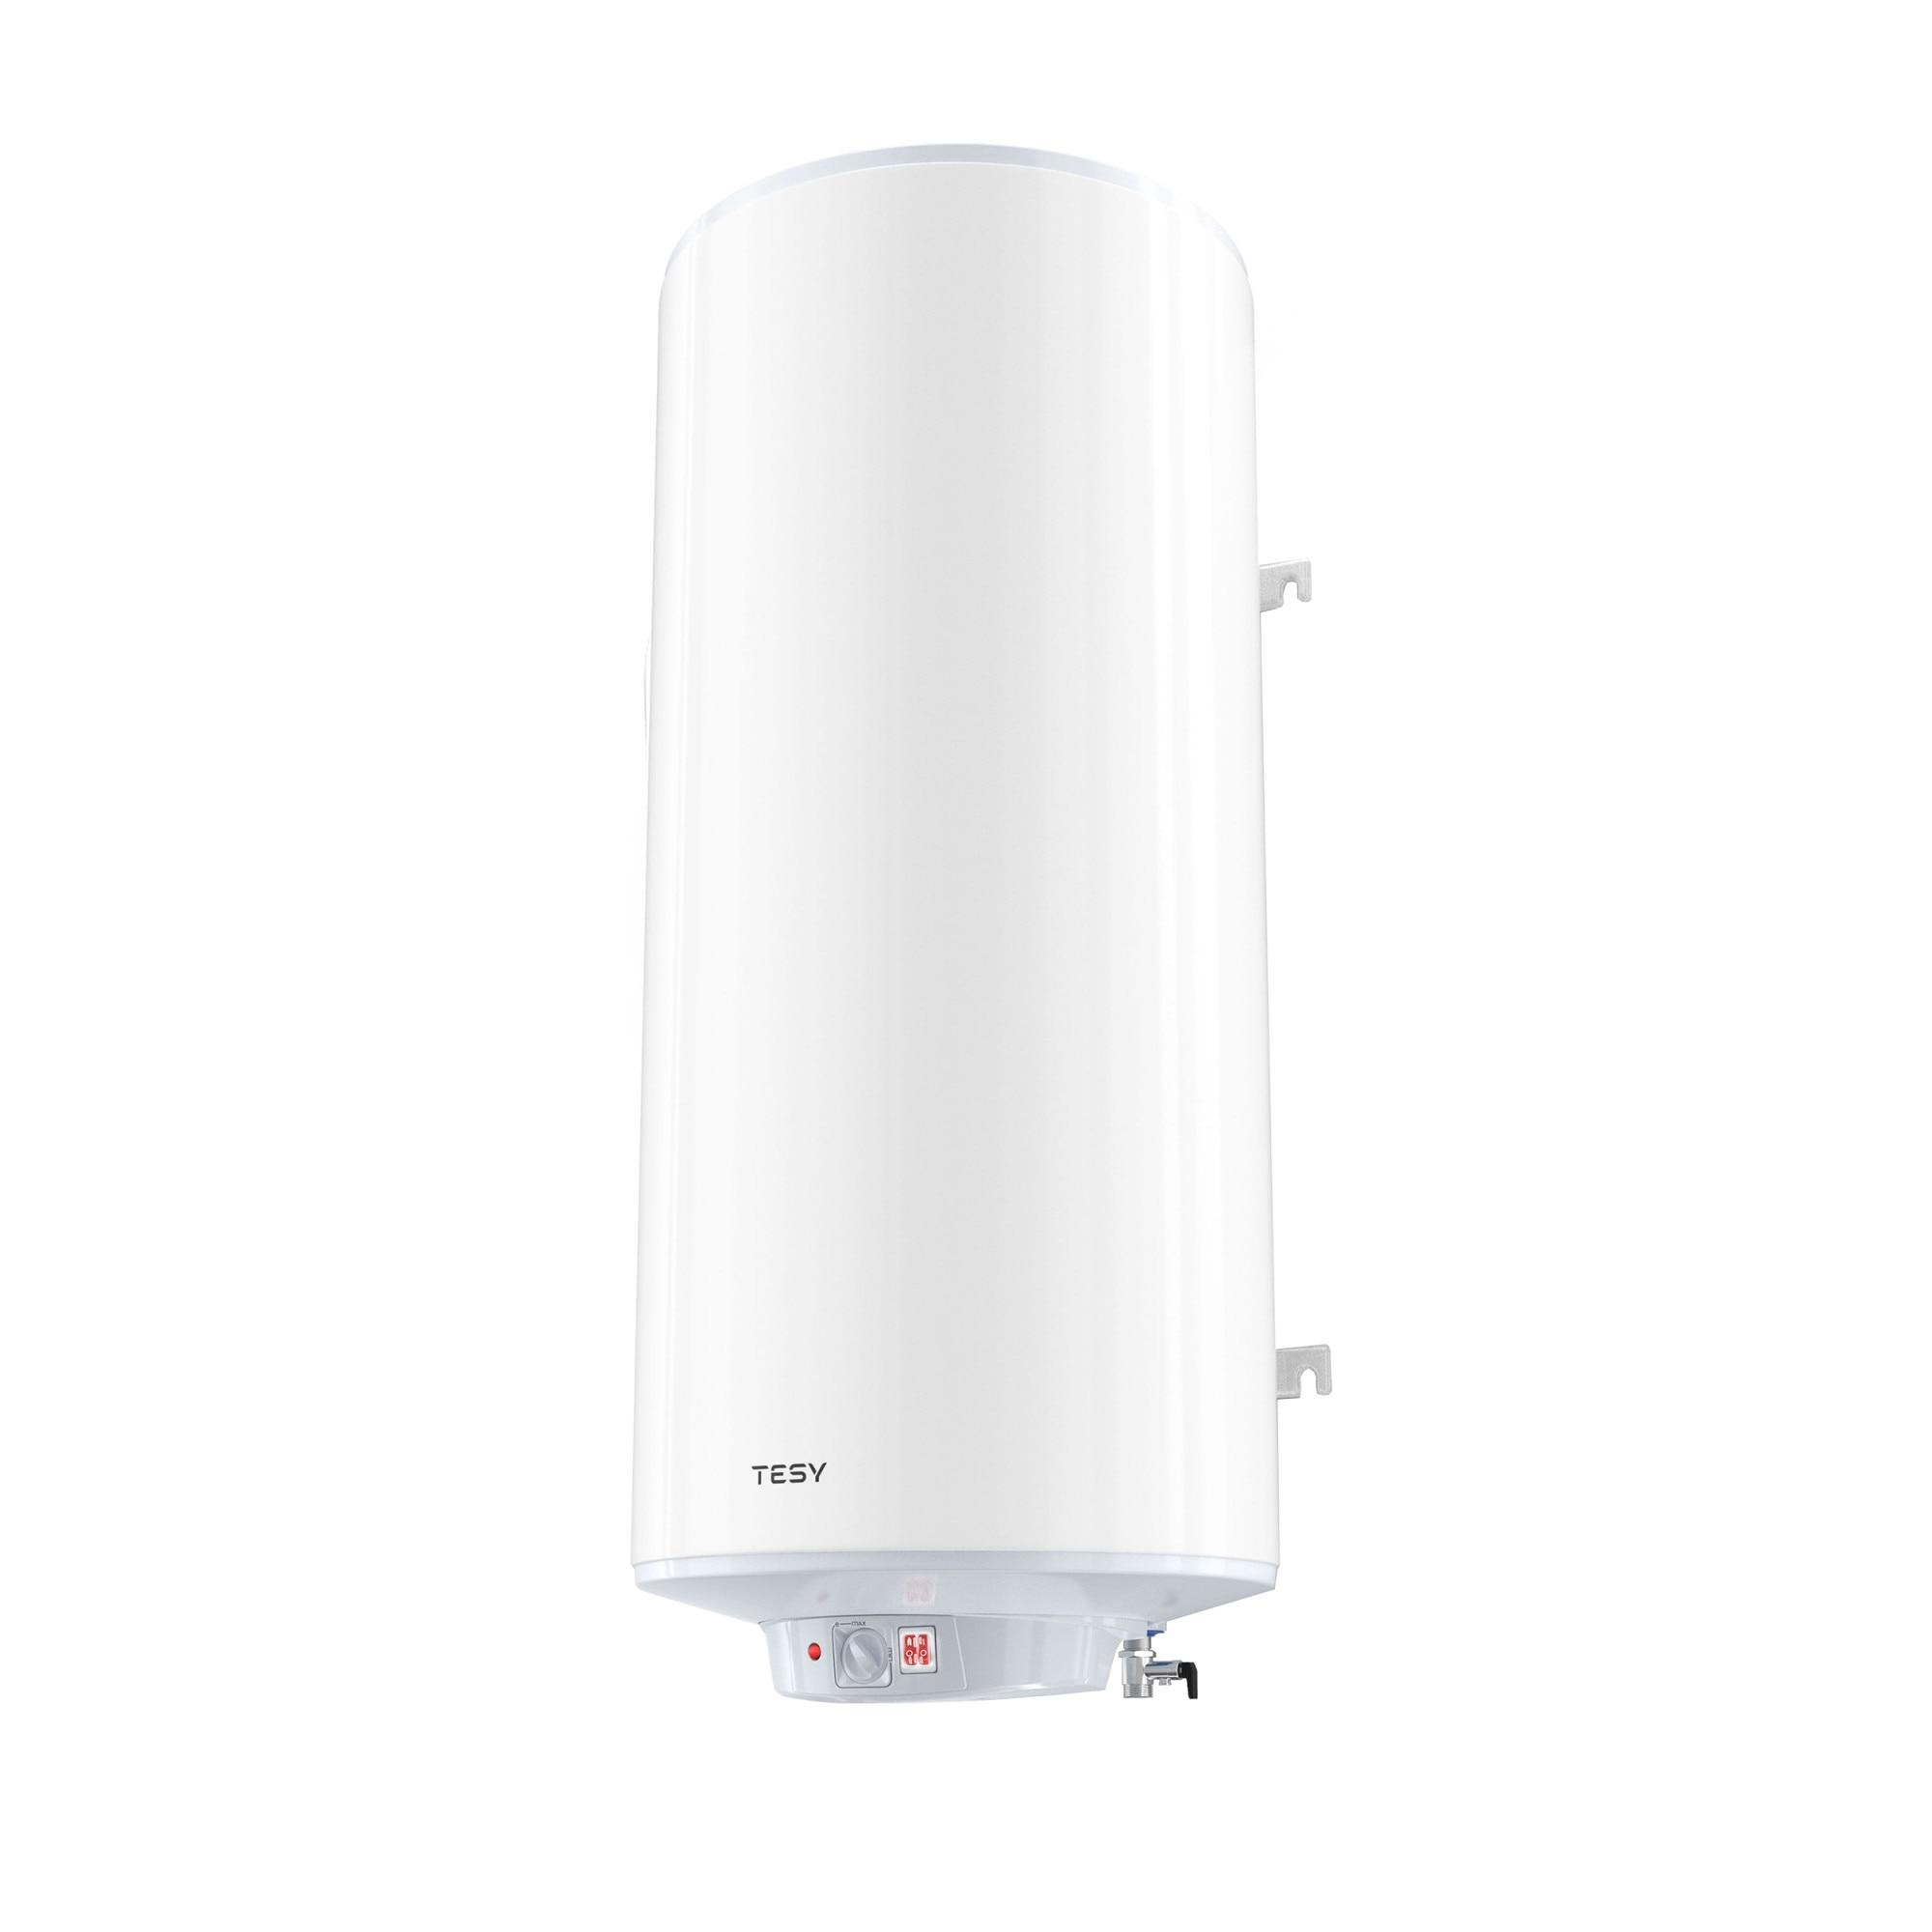 Fotografie Boiler electric Tesy MaxEau GCV 2005620 D06 SRC, 2000W, 200 l, 8 bar, protectie anti-inghet, 40mm, Alb